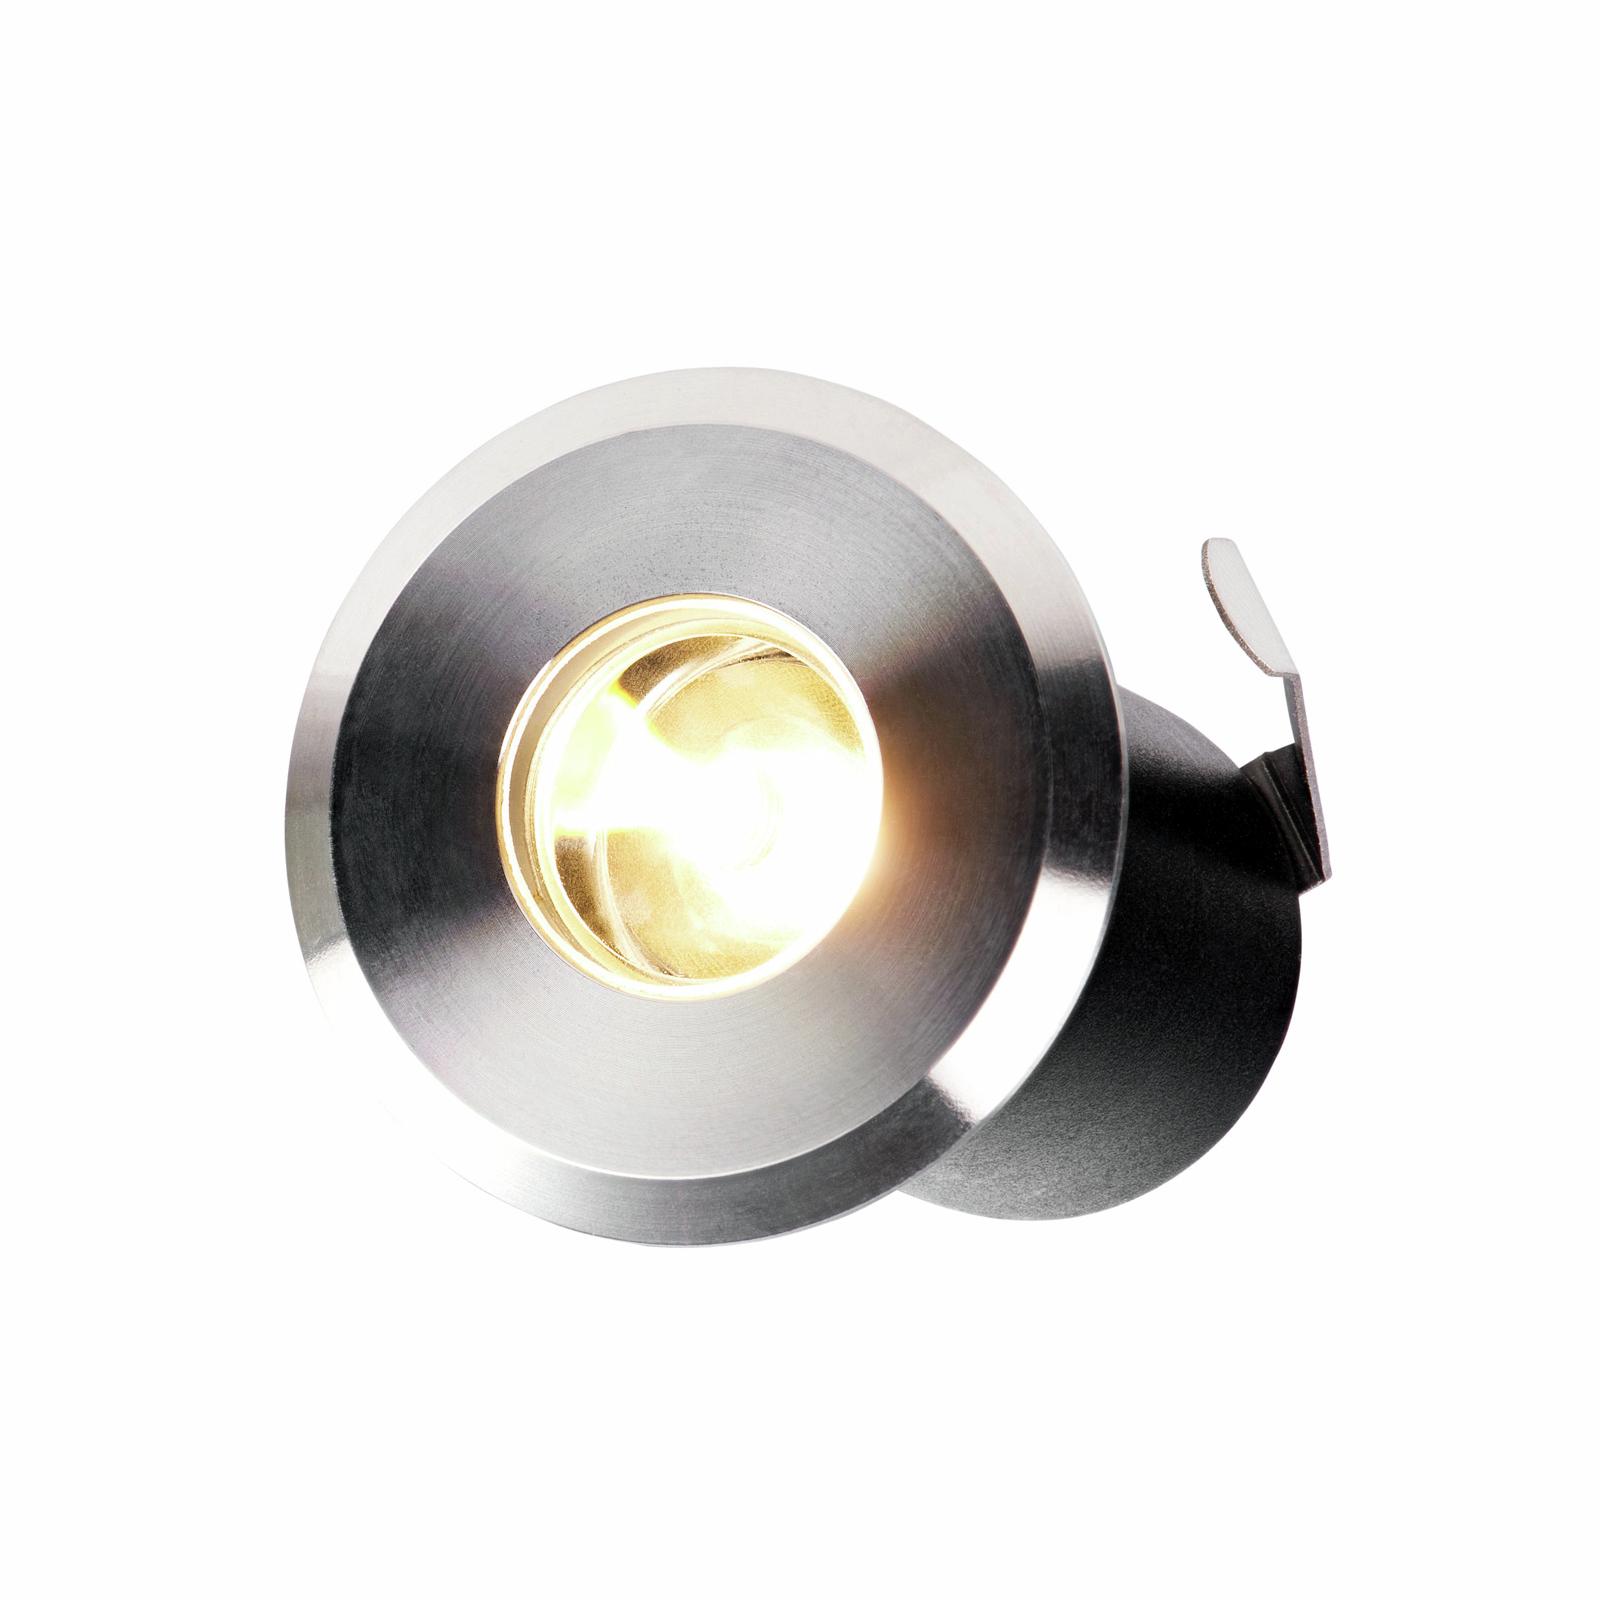 Elluminate Warm White Stainless Steel Deck Lights - 4 Pack